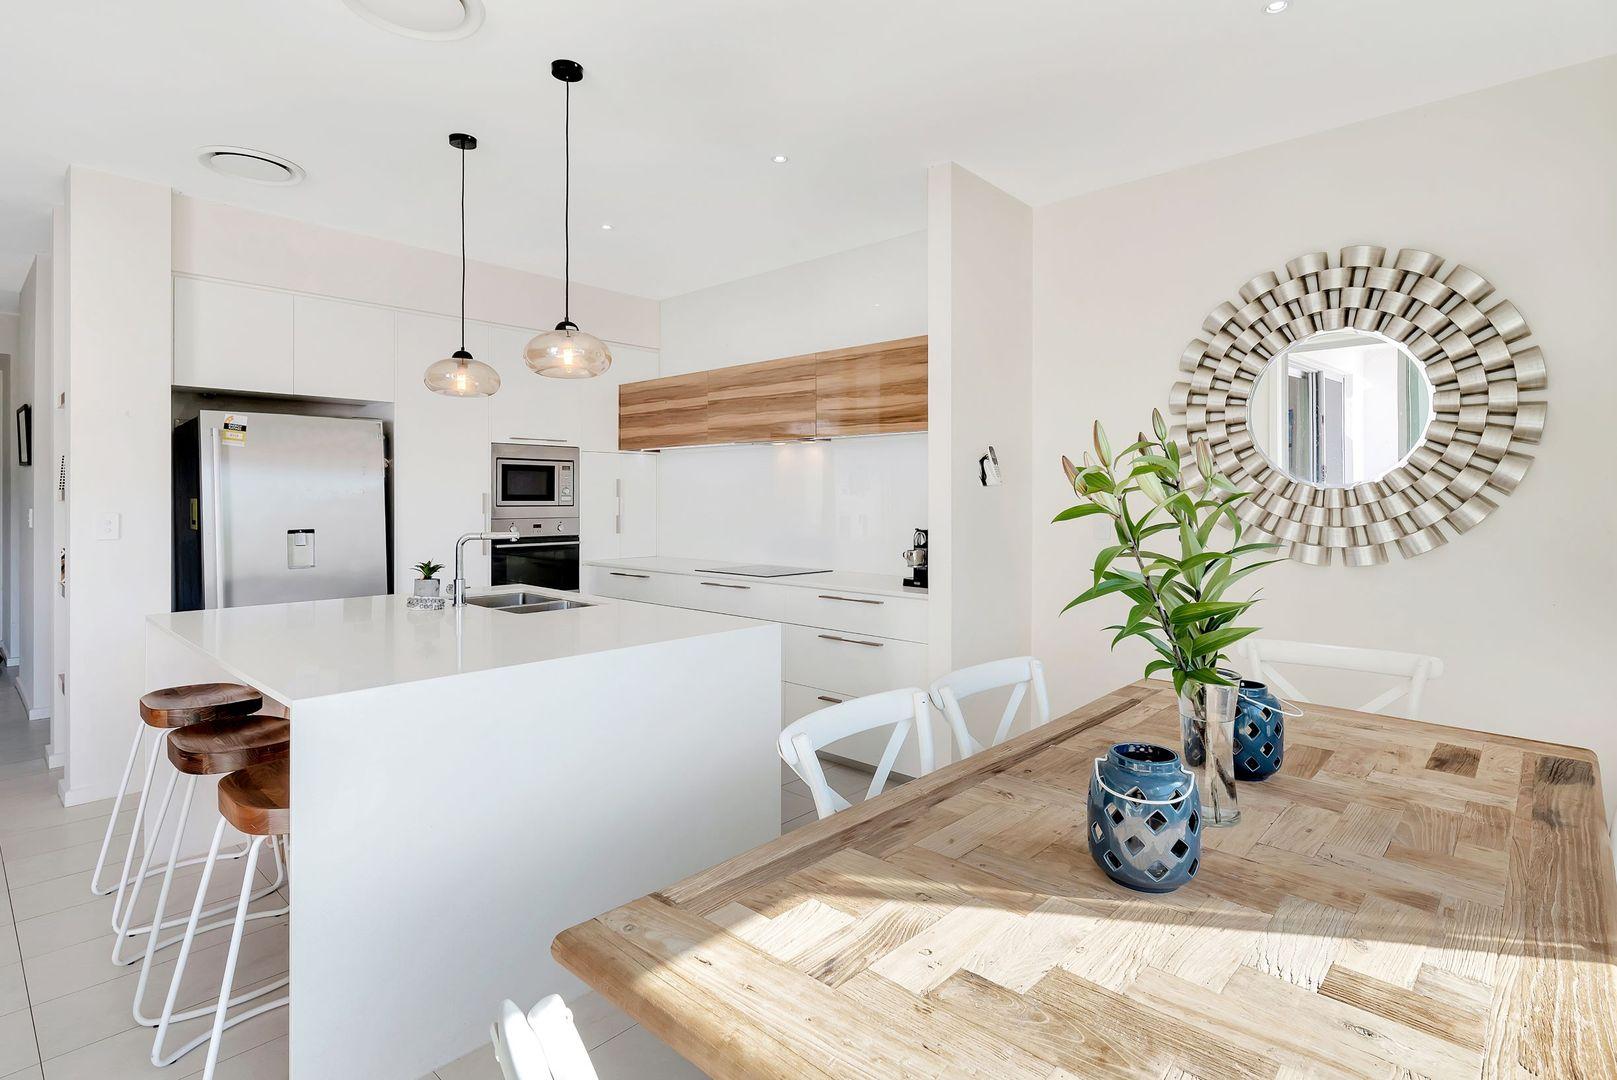 5/5 Egerton Street, Southport QLD 4215, Image 0